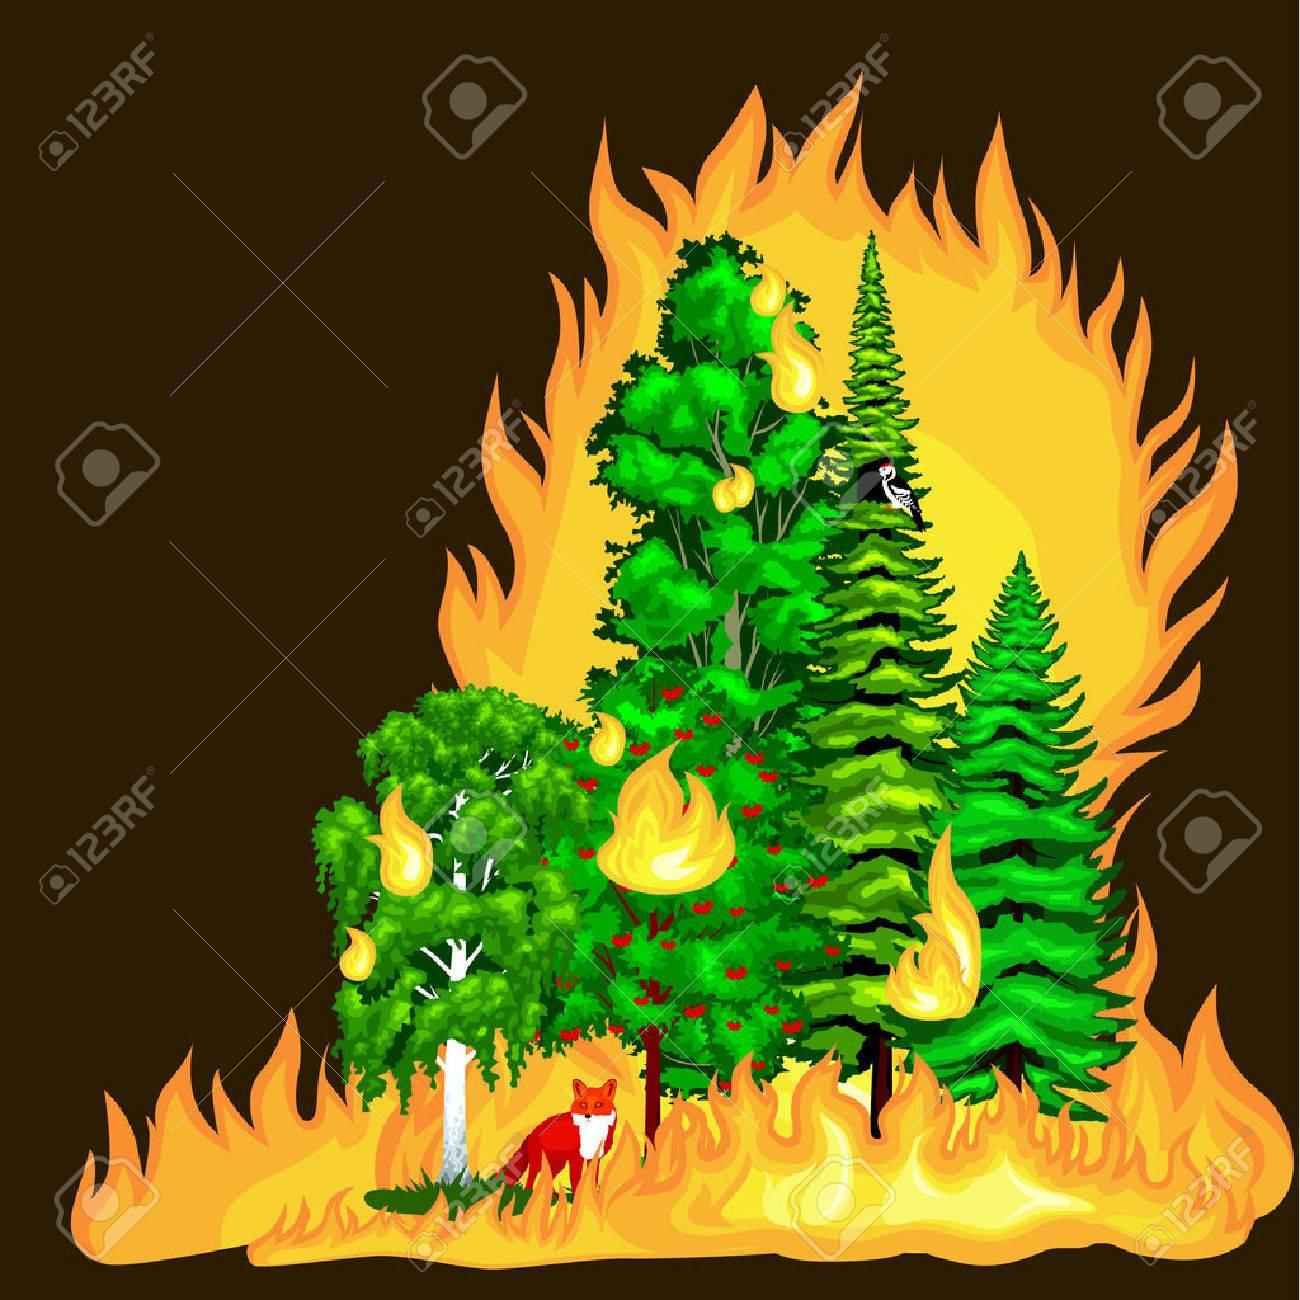 50 Burning Bush Cliparts, Stock Vector And Royalty Free Burning ...